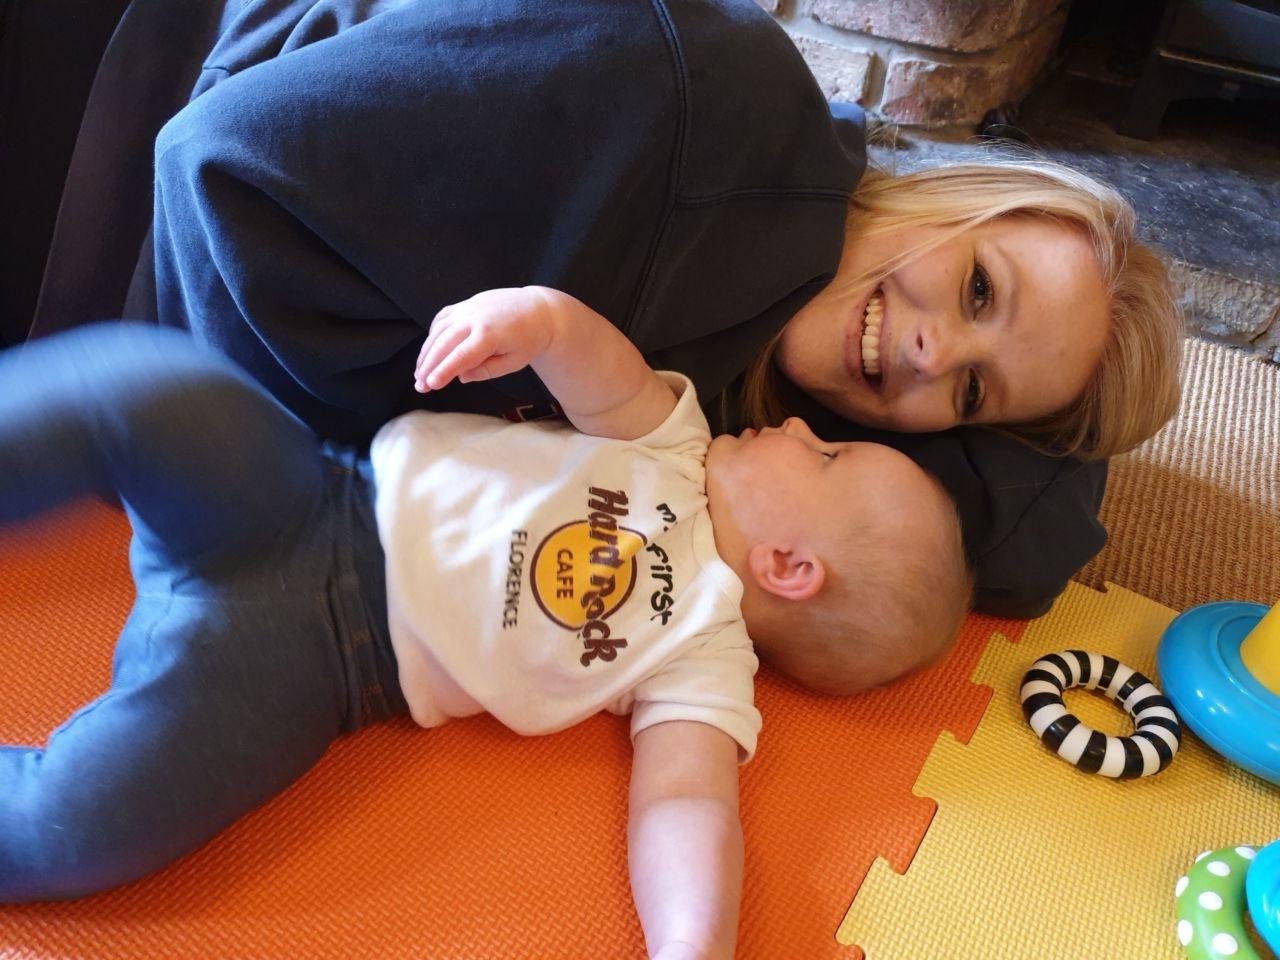 Emmy at 8 months